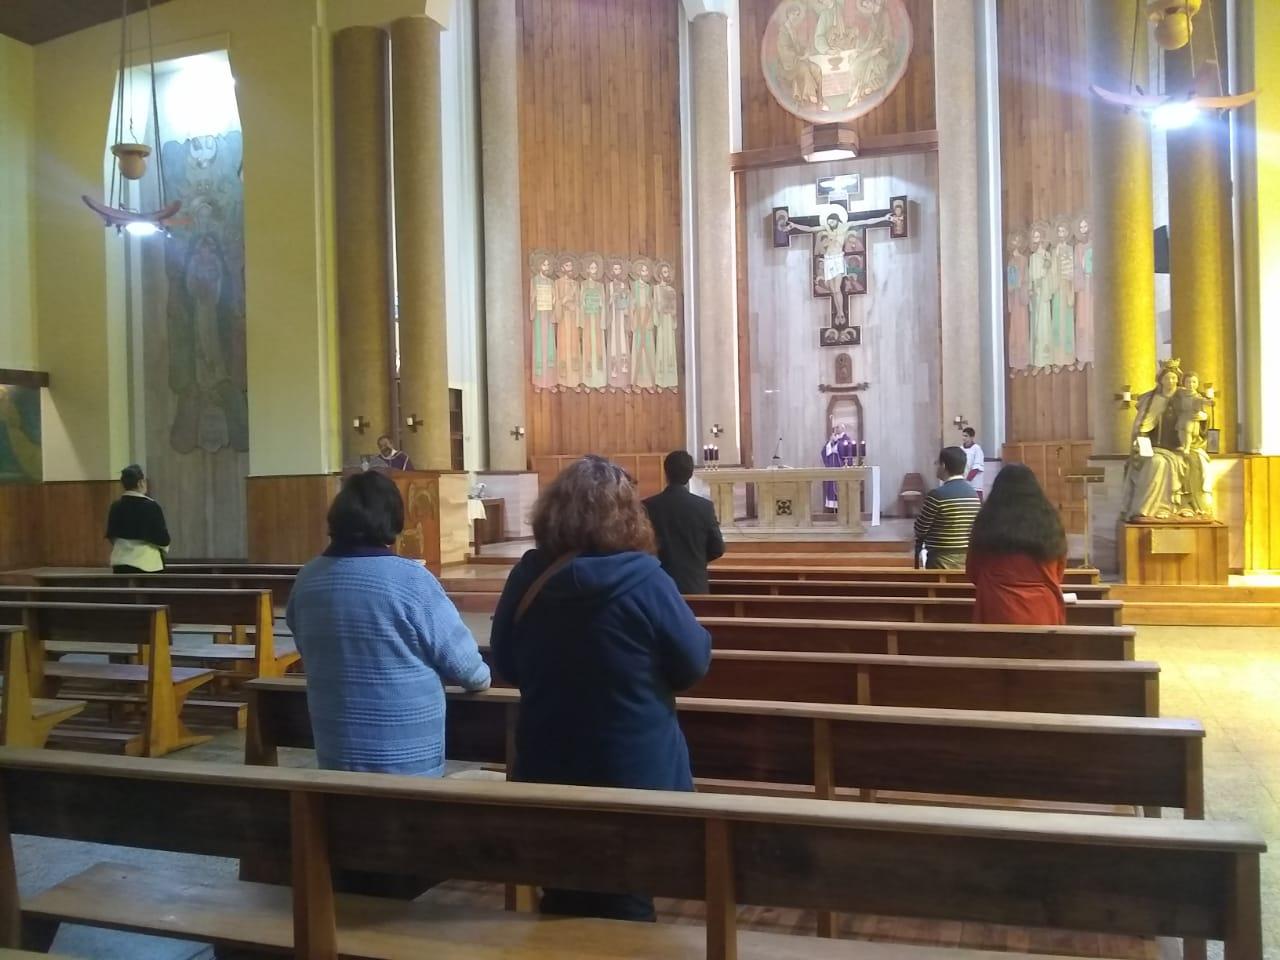 Obispo no respeta la clausura y realiza misa dominical con fieles al interior